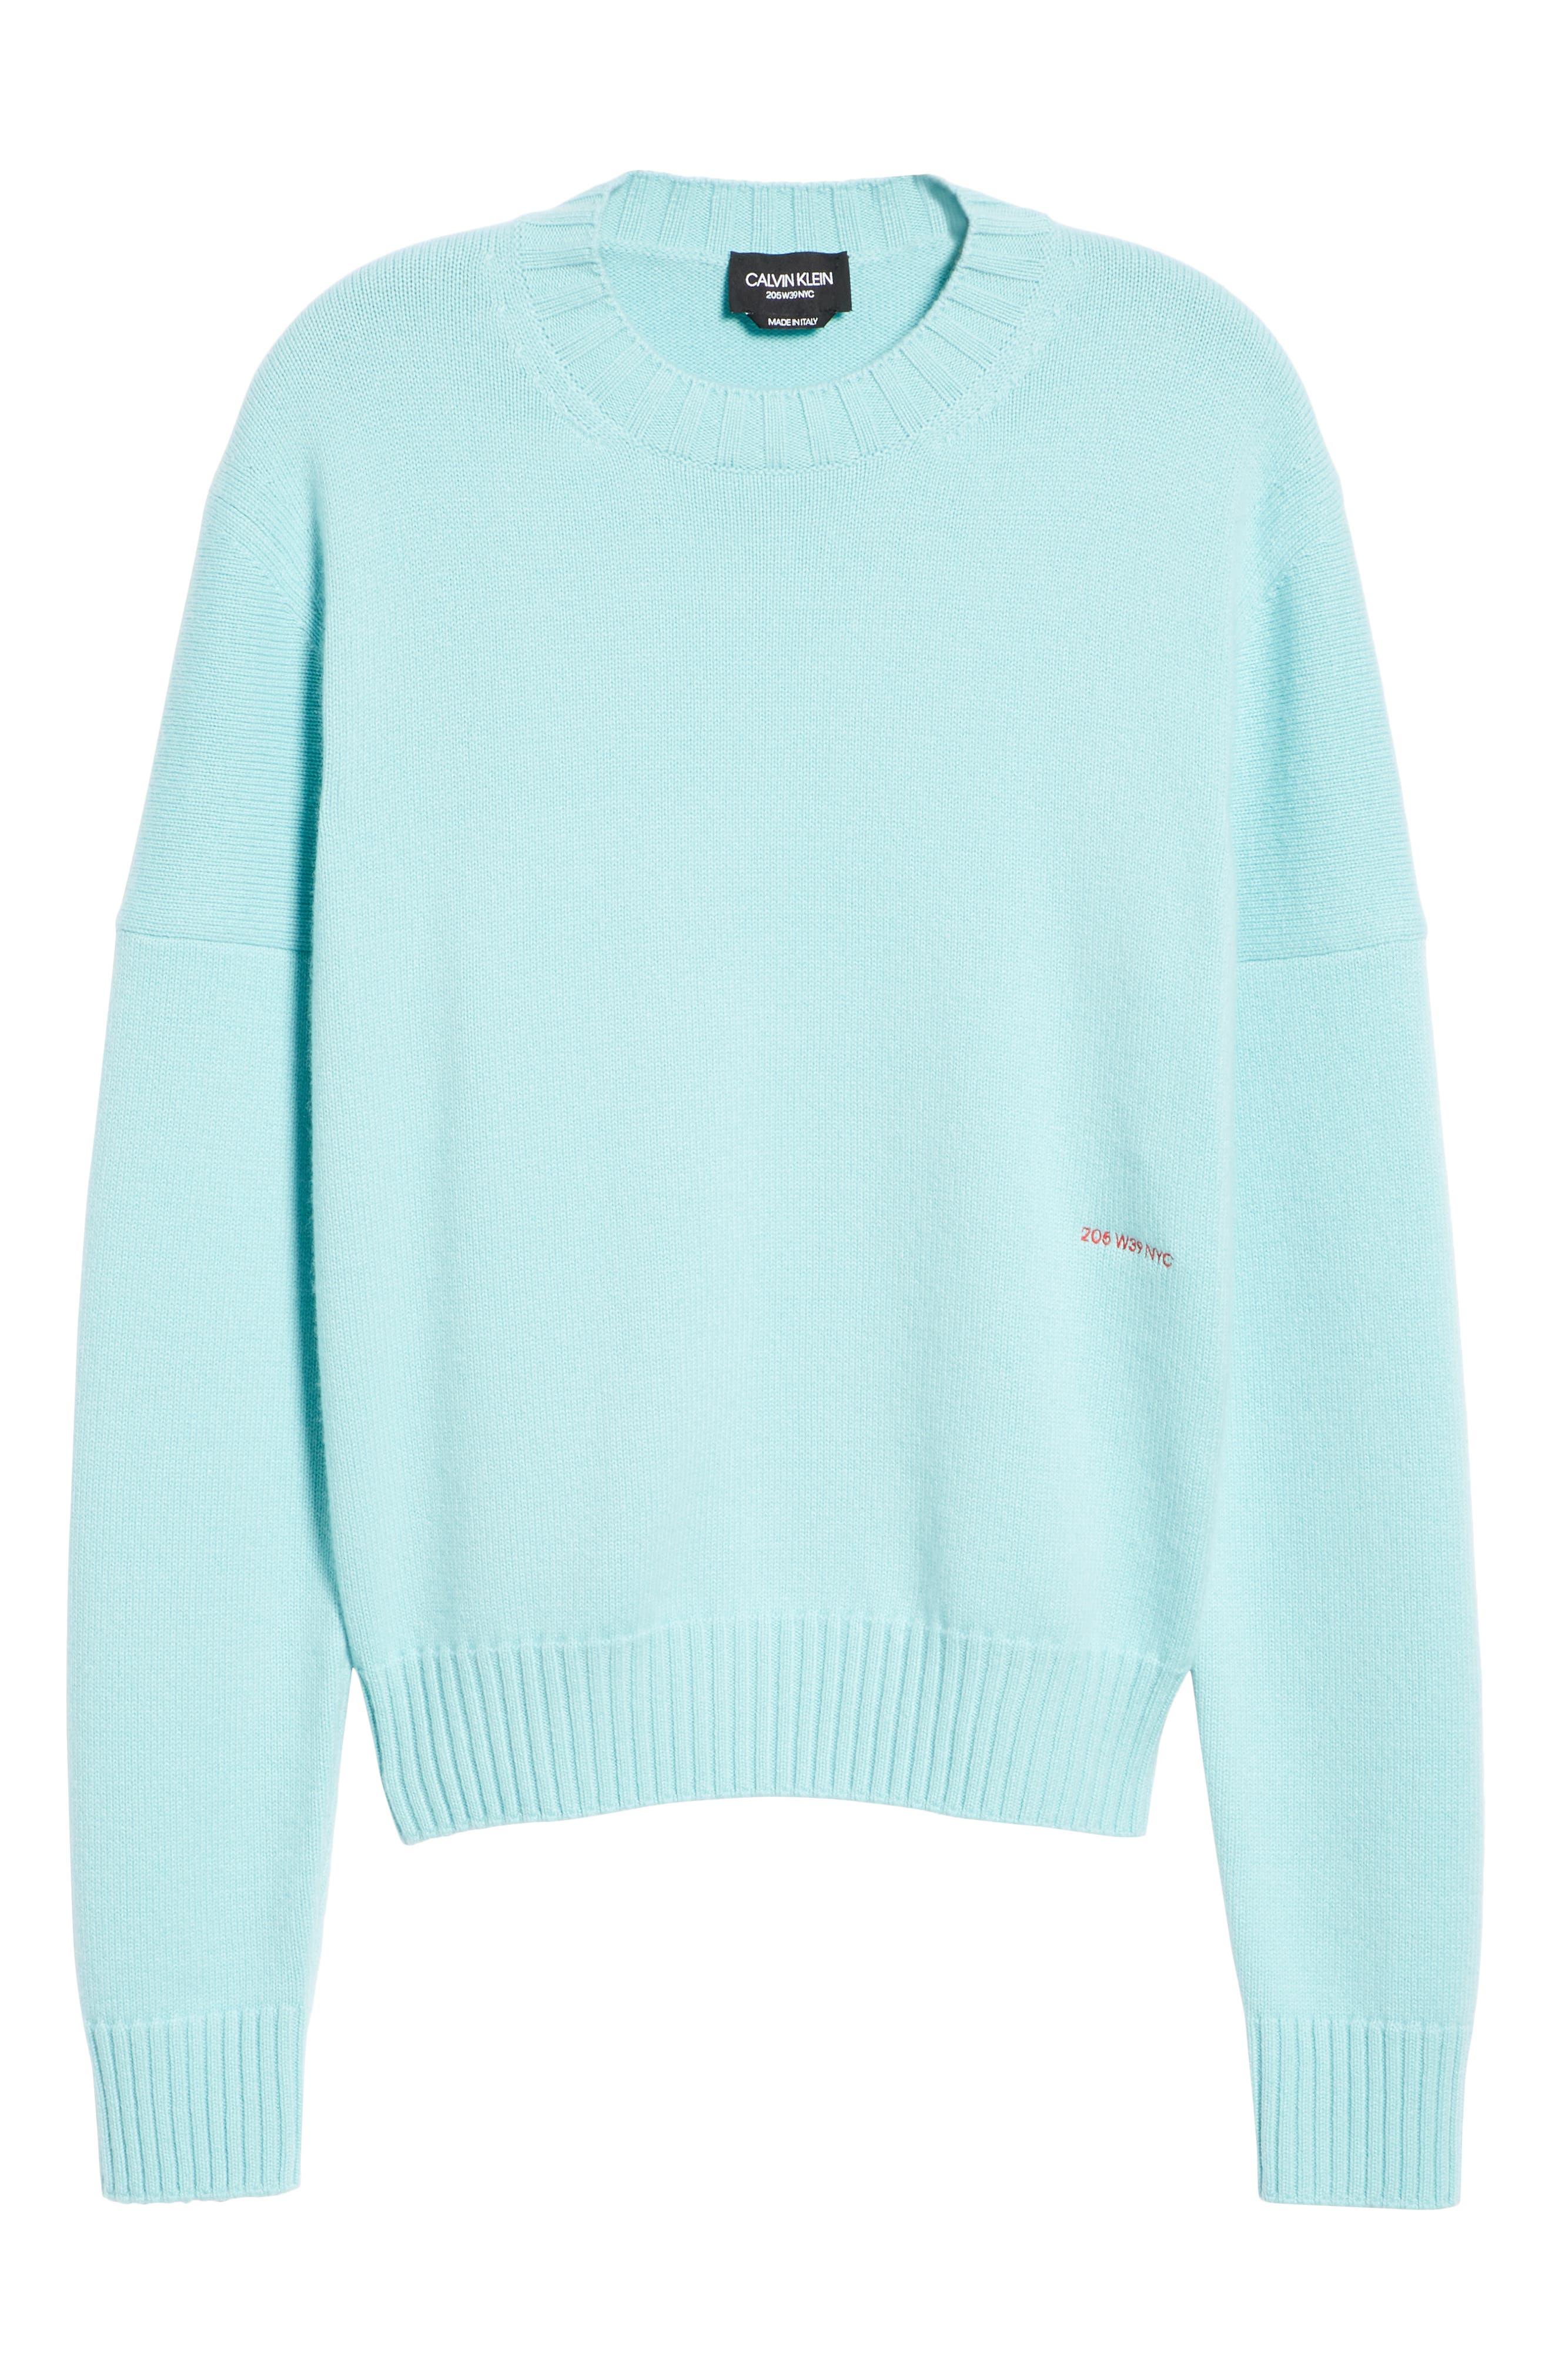 CALVIN KLEIN 205W39NYC, Logo Cashmere Sweater, Alternate thumbnail 7, color, SKY BLUE